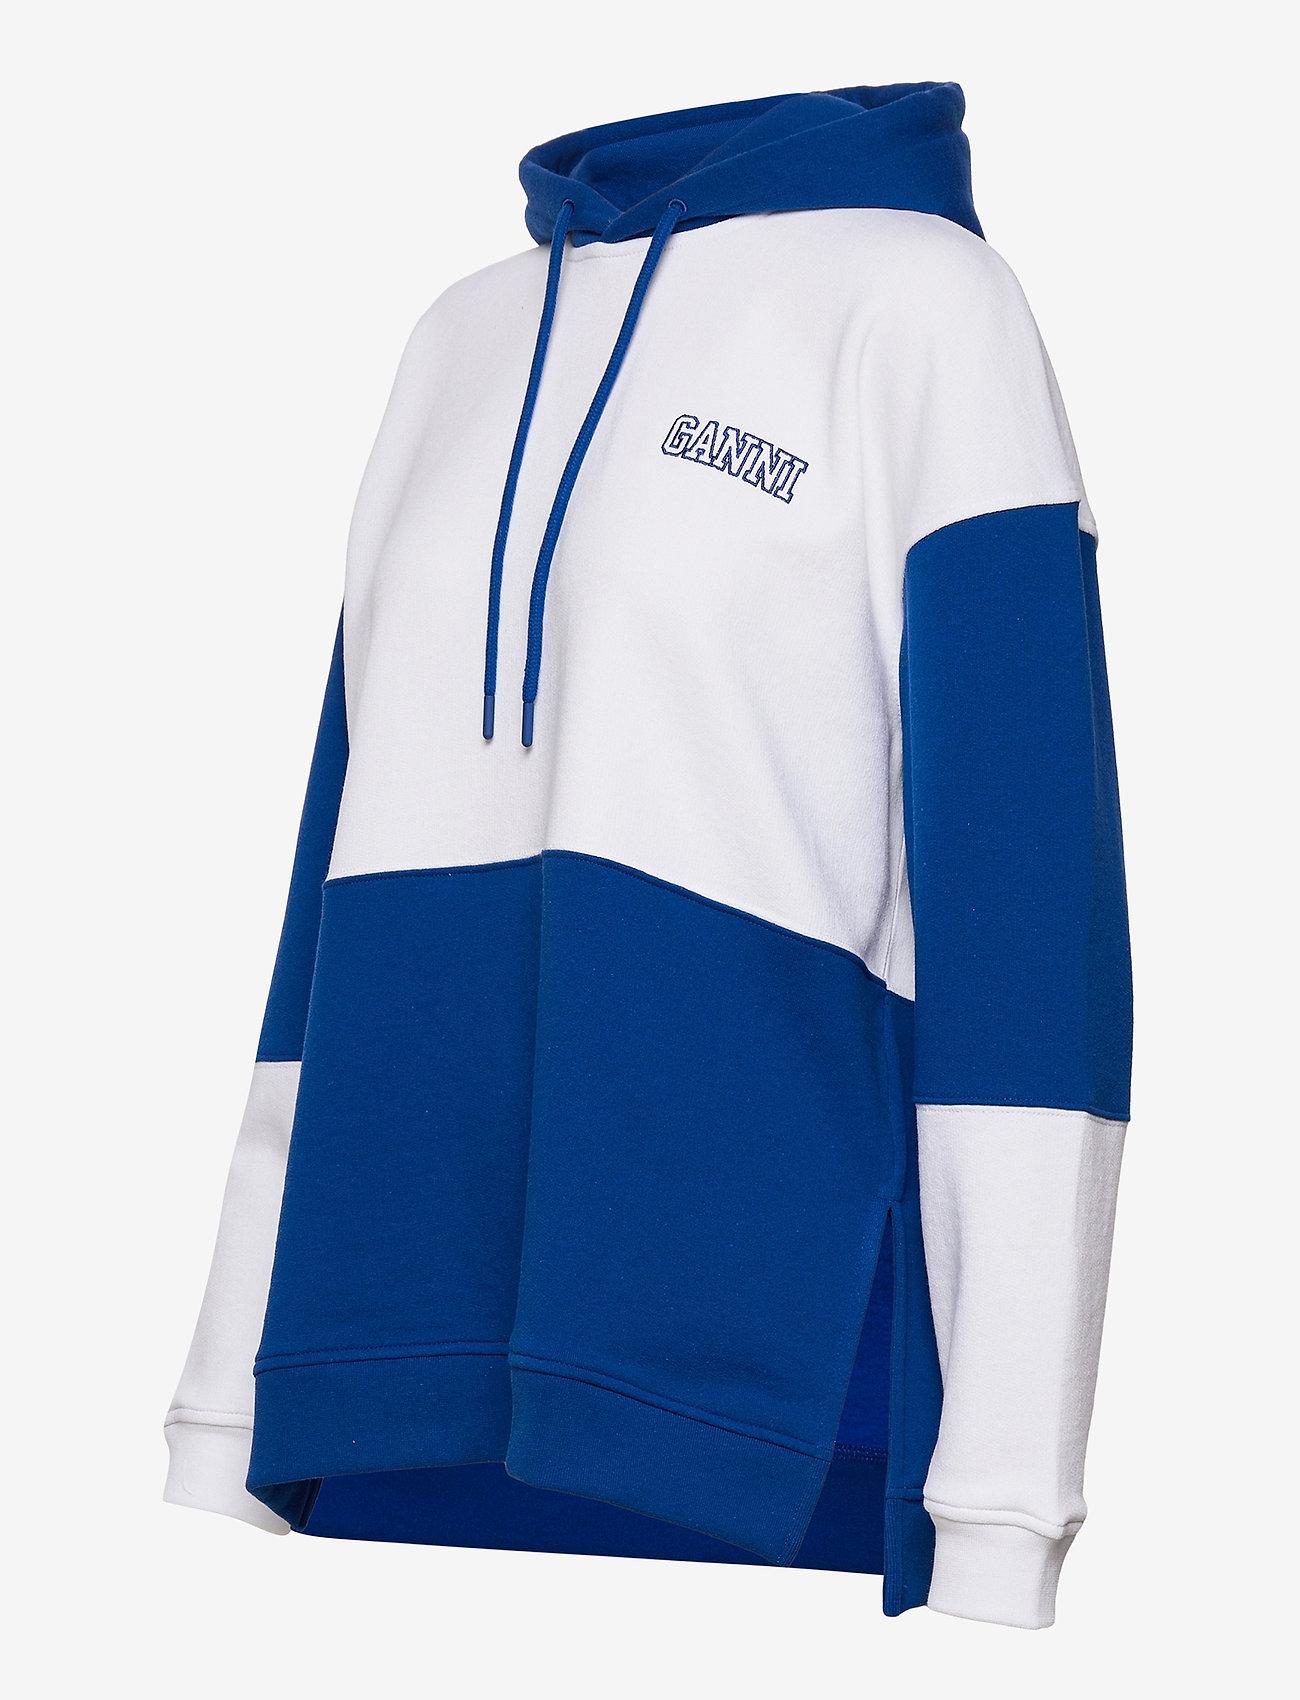 Ganni - Software Isoli - sweatshirts & hoodies - daphne - 2